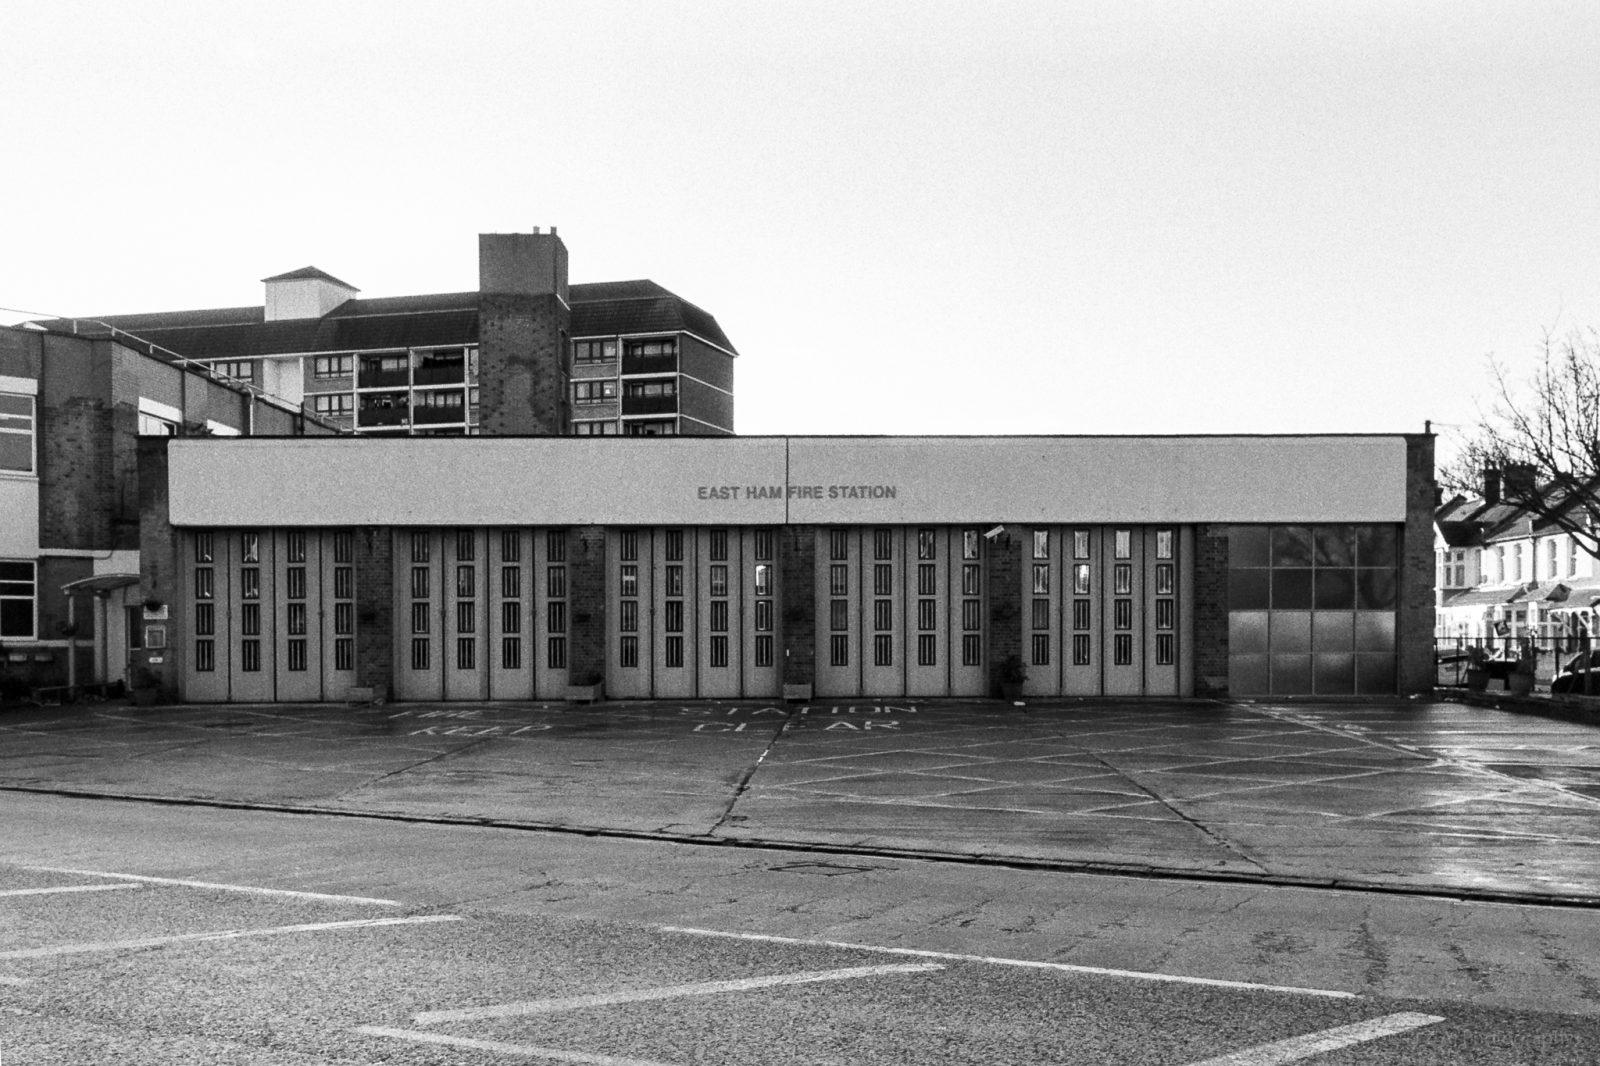 East Ham  Fire Station